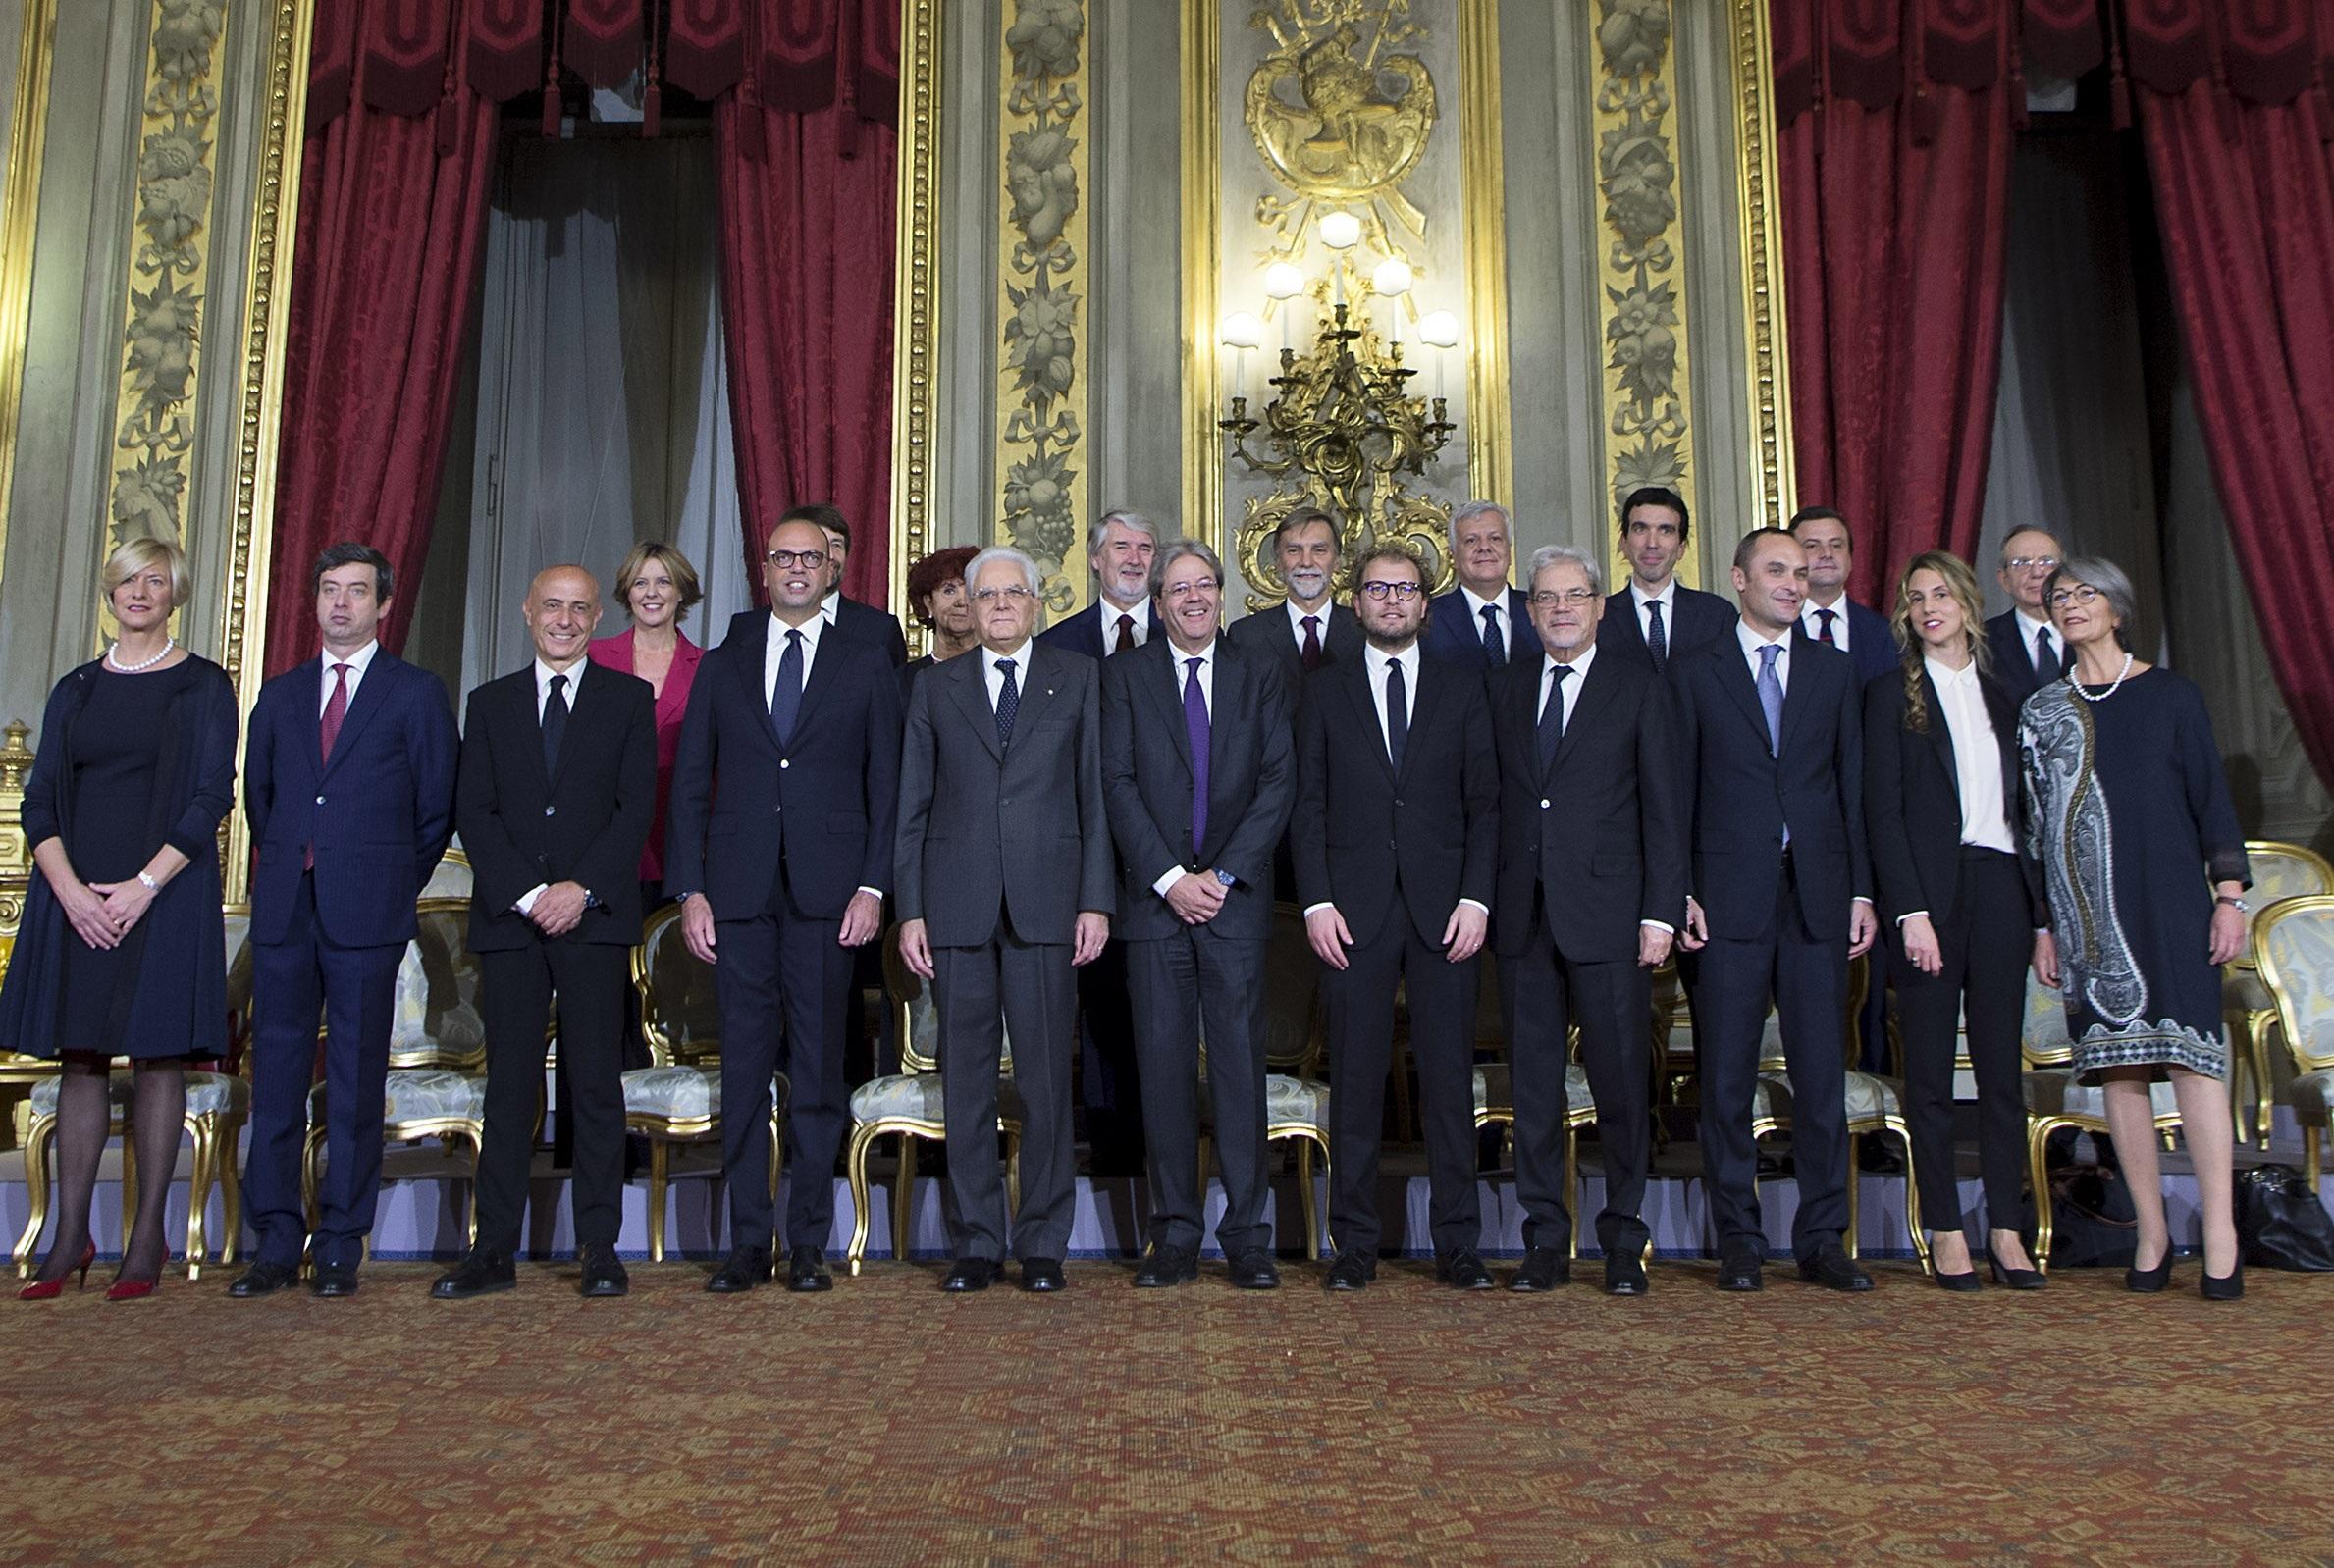 governo - photo #29